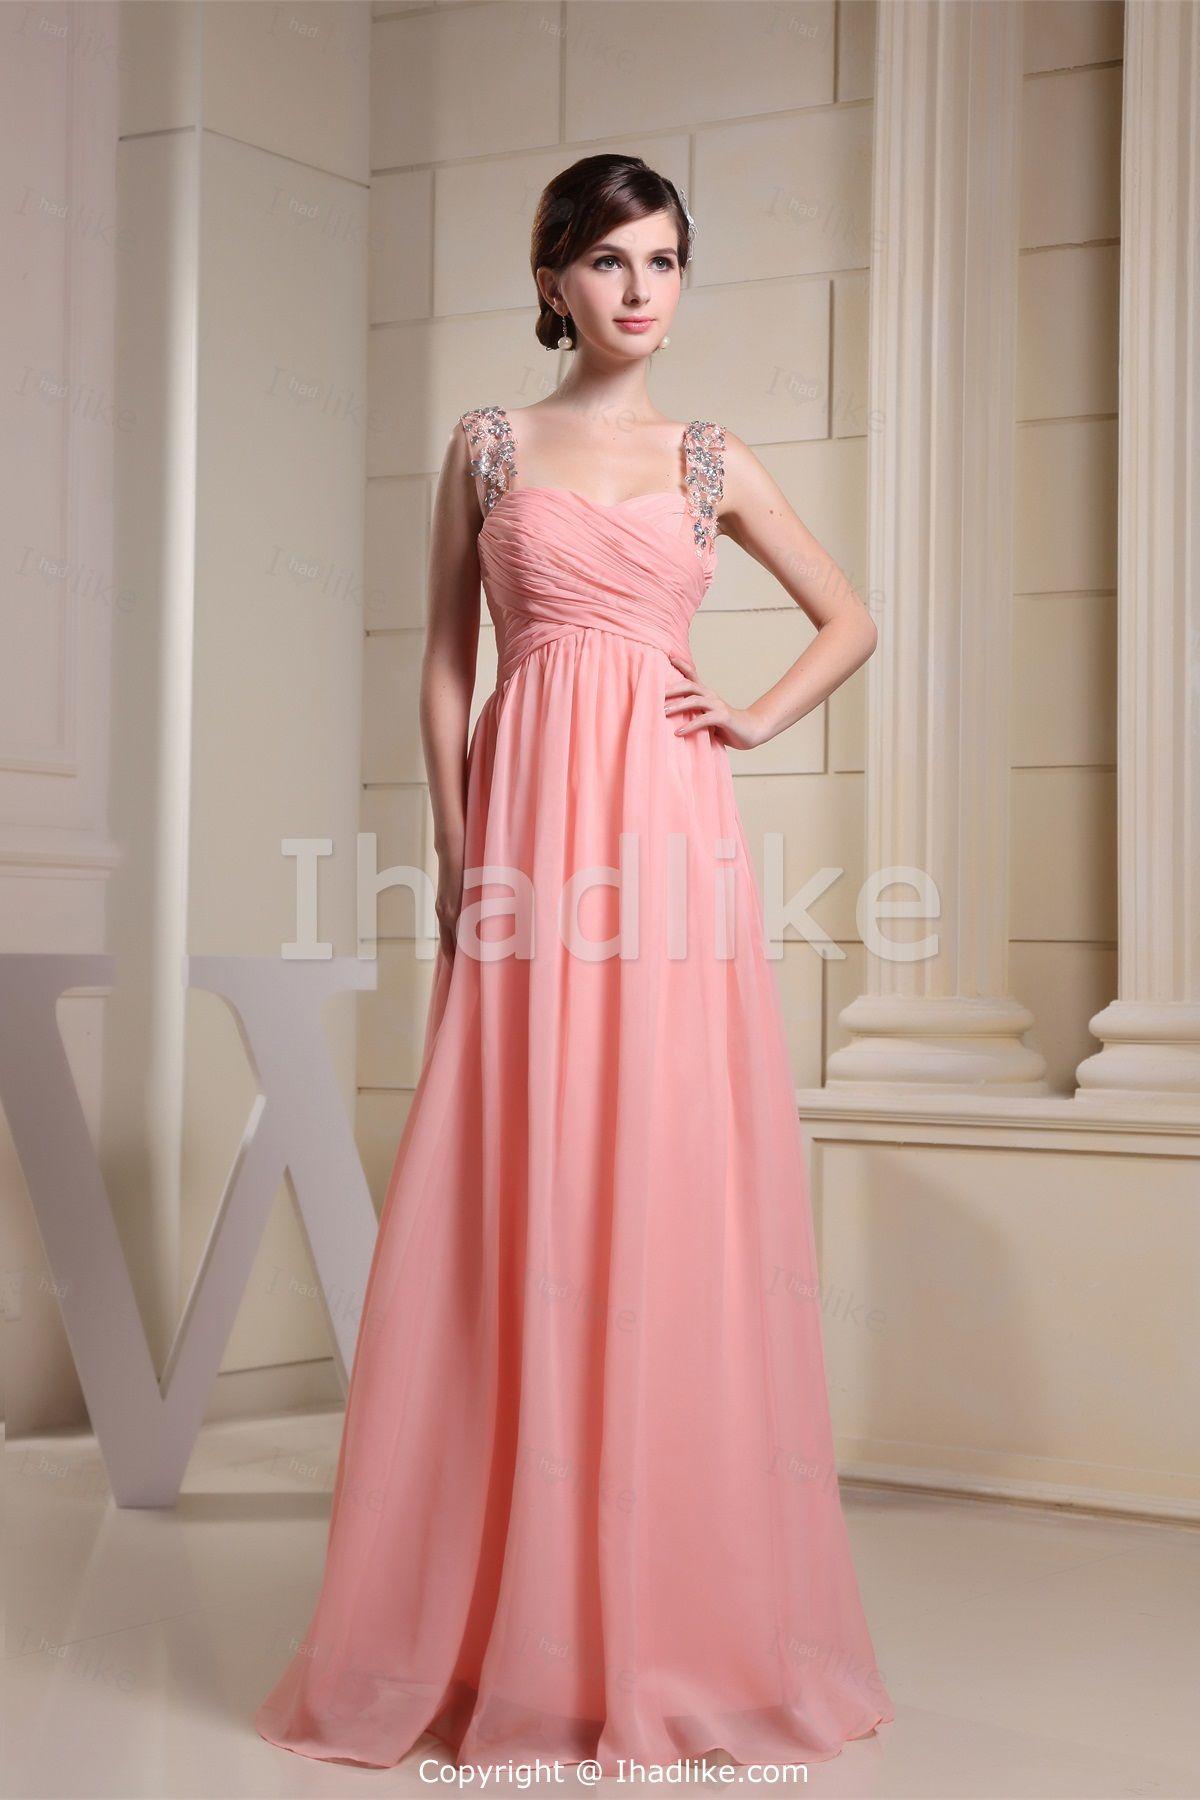 Watermelon Floor-Length Chiffon Bridesmaid Dresses -Bridesmaid ...